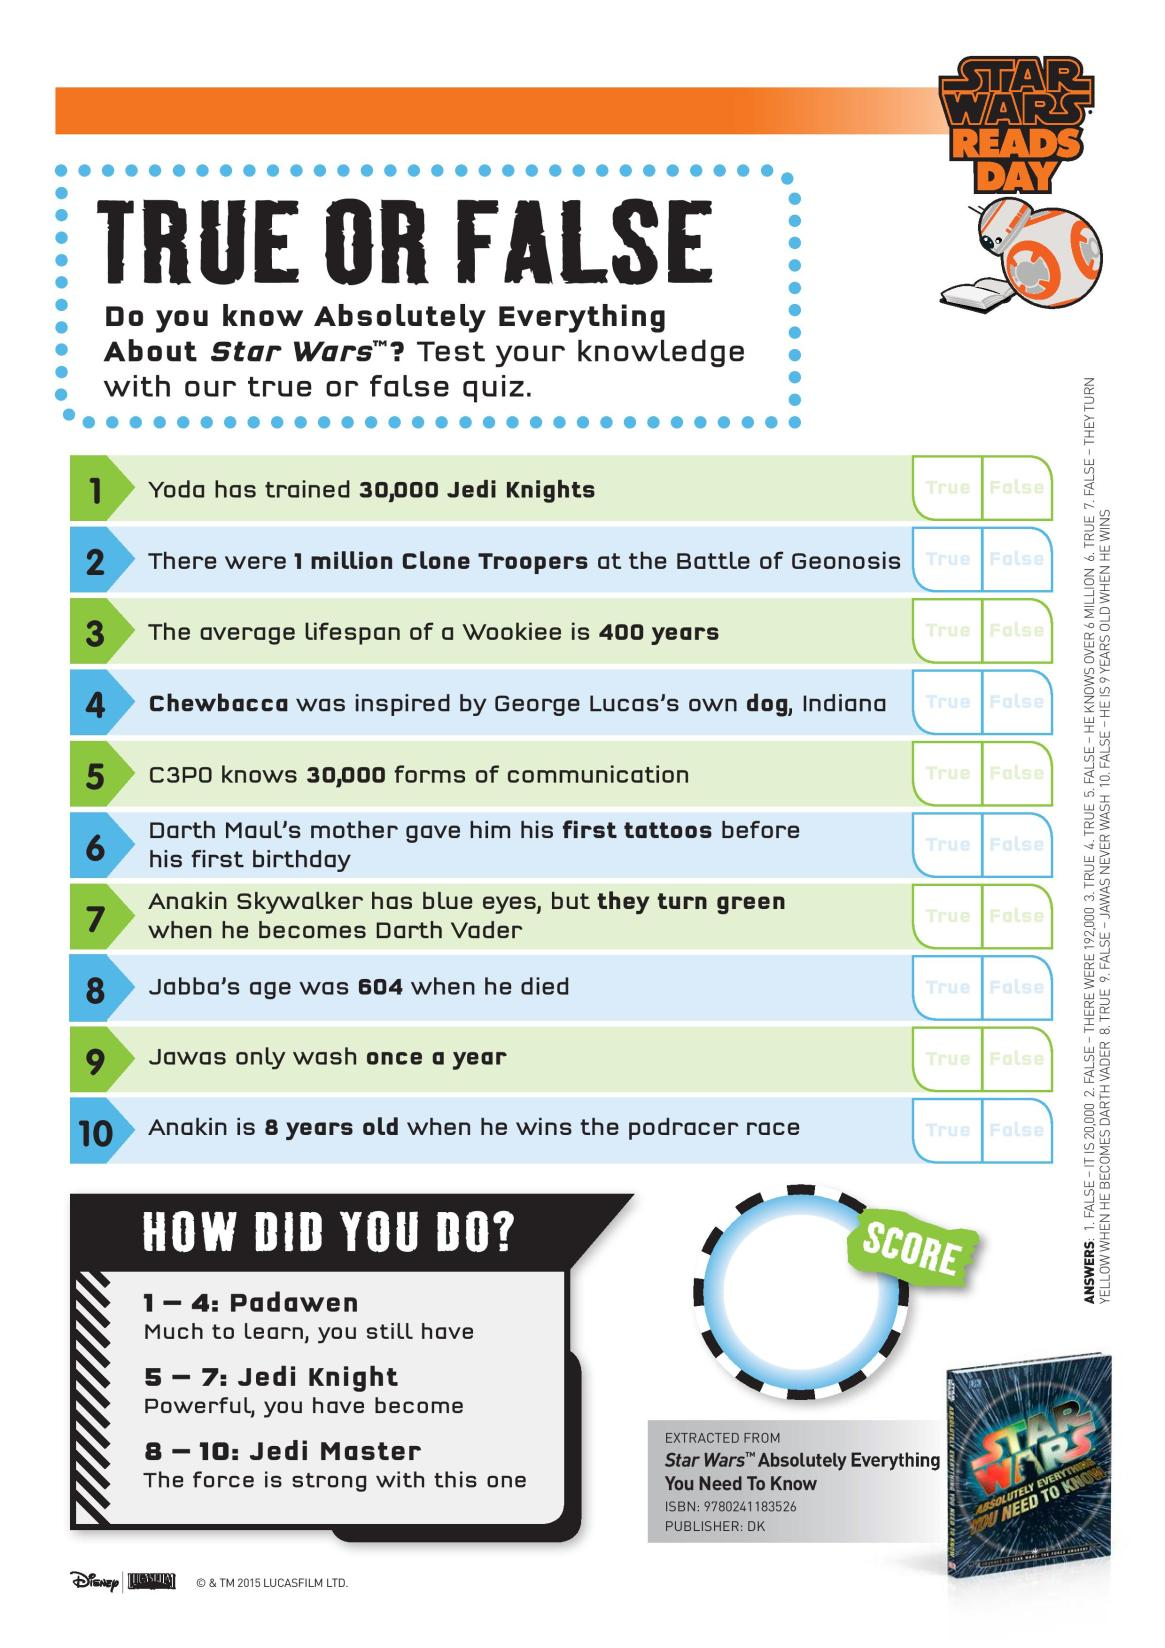 Star Wars True or False Quiz